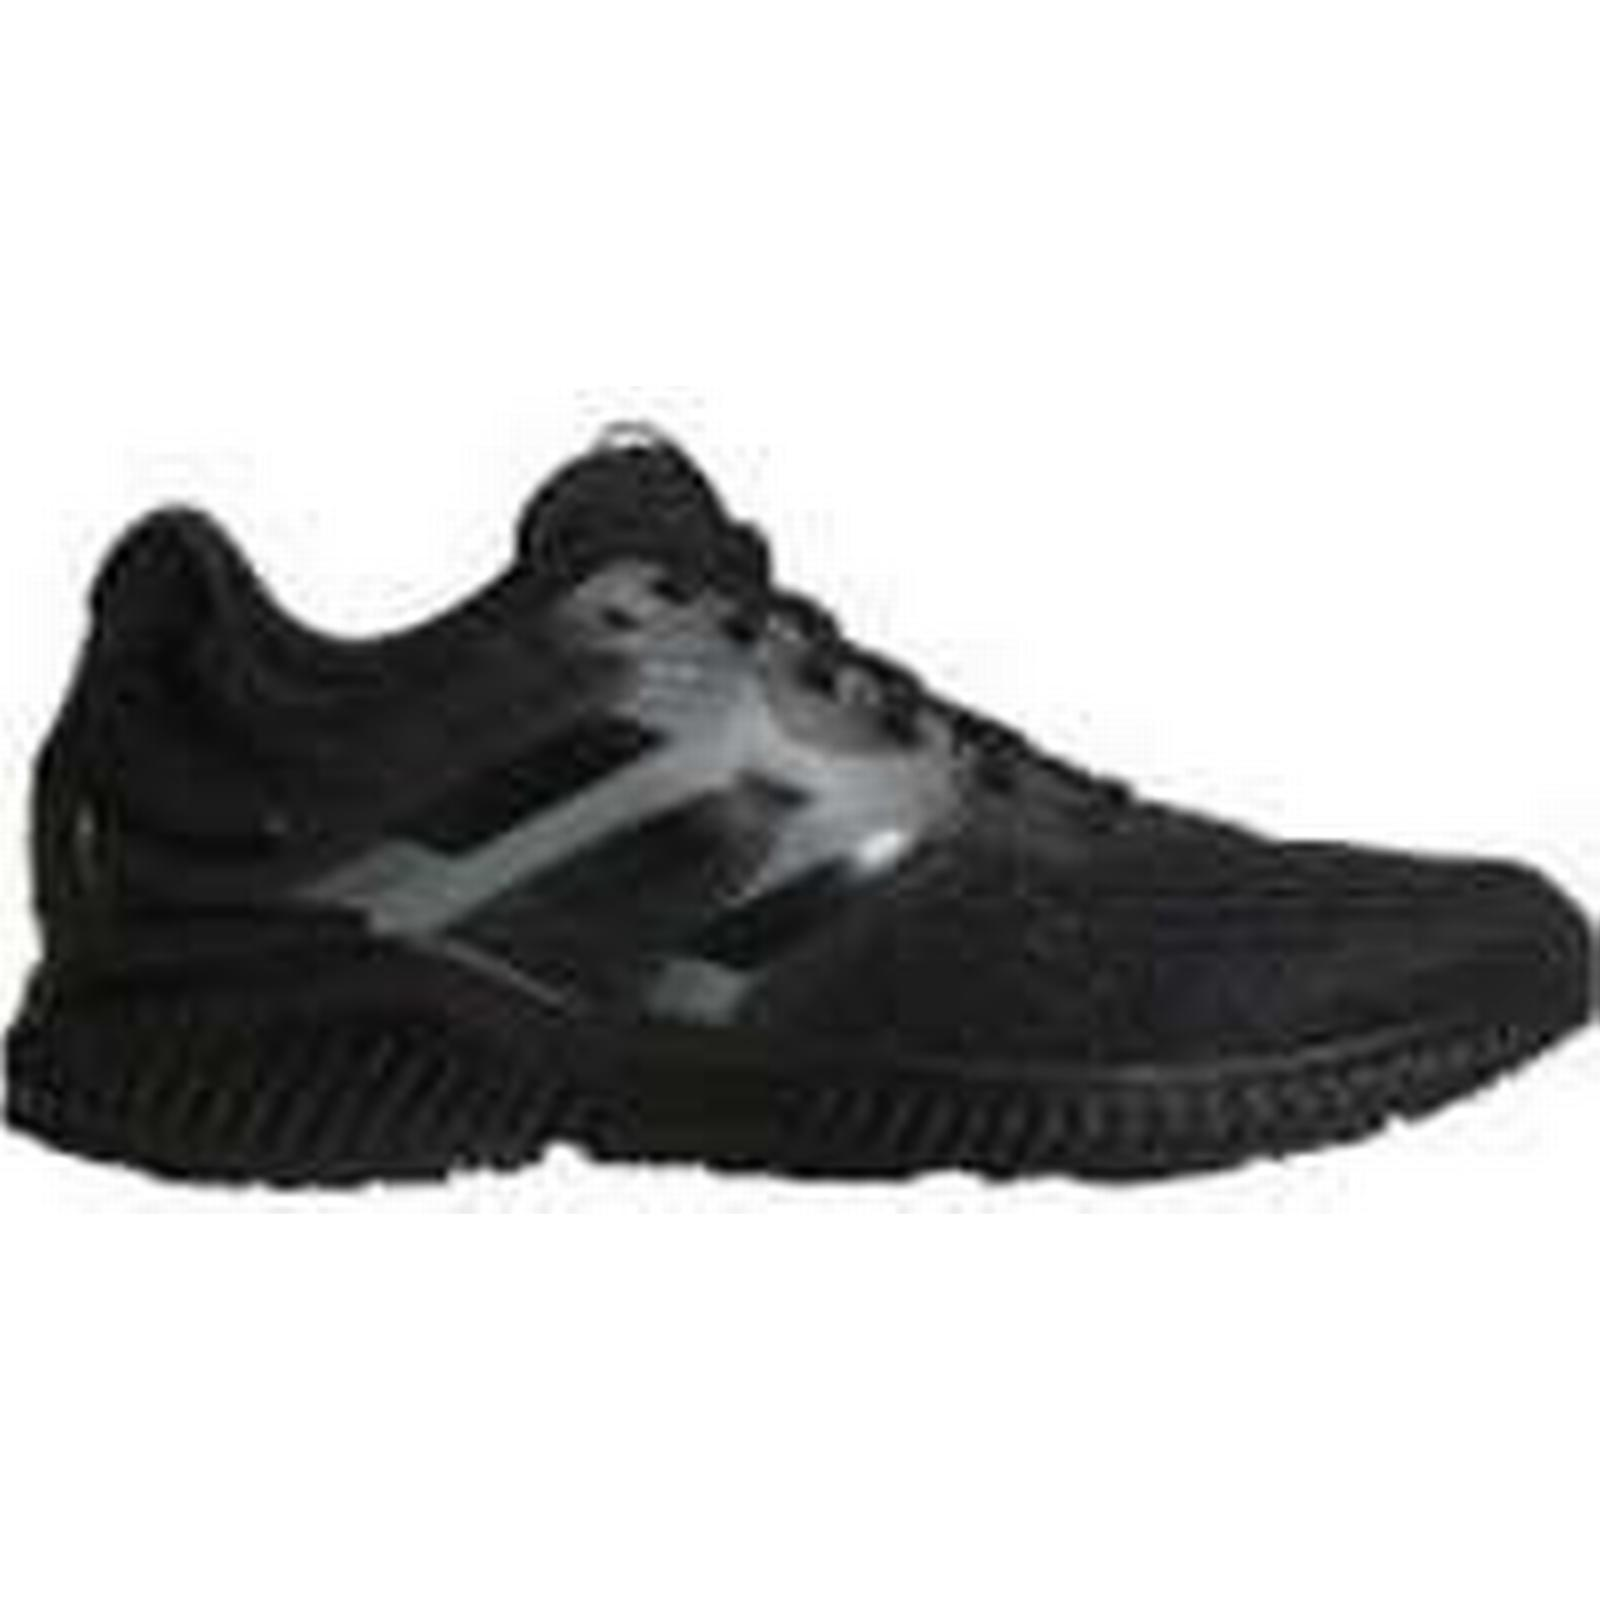 Adidas Women's Aerobounce Training Shoes - 4 Black/White/Silver - US 5.5/UK 4 - - Black/White/silver 30de33